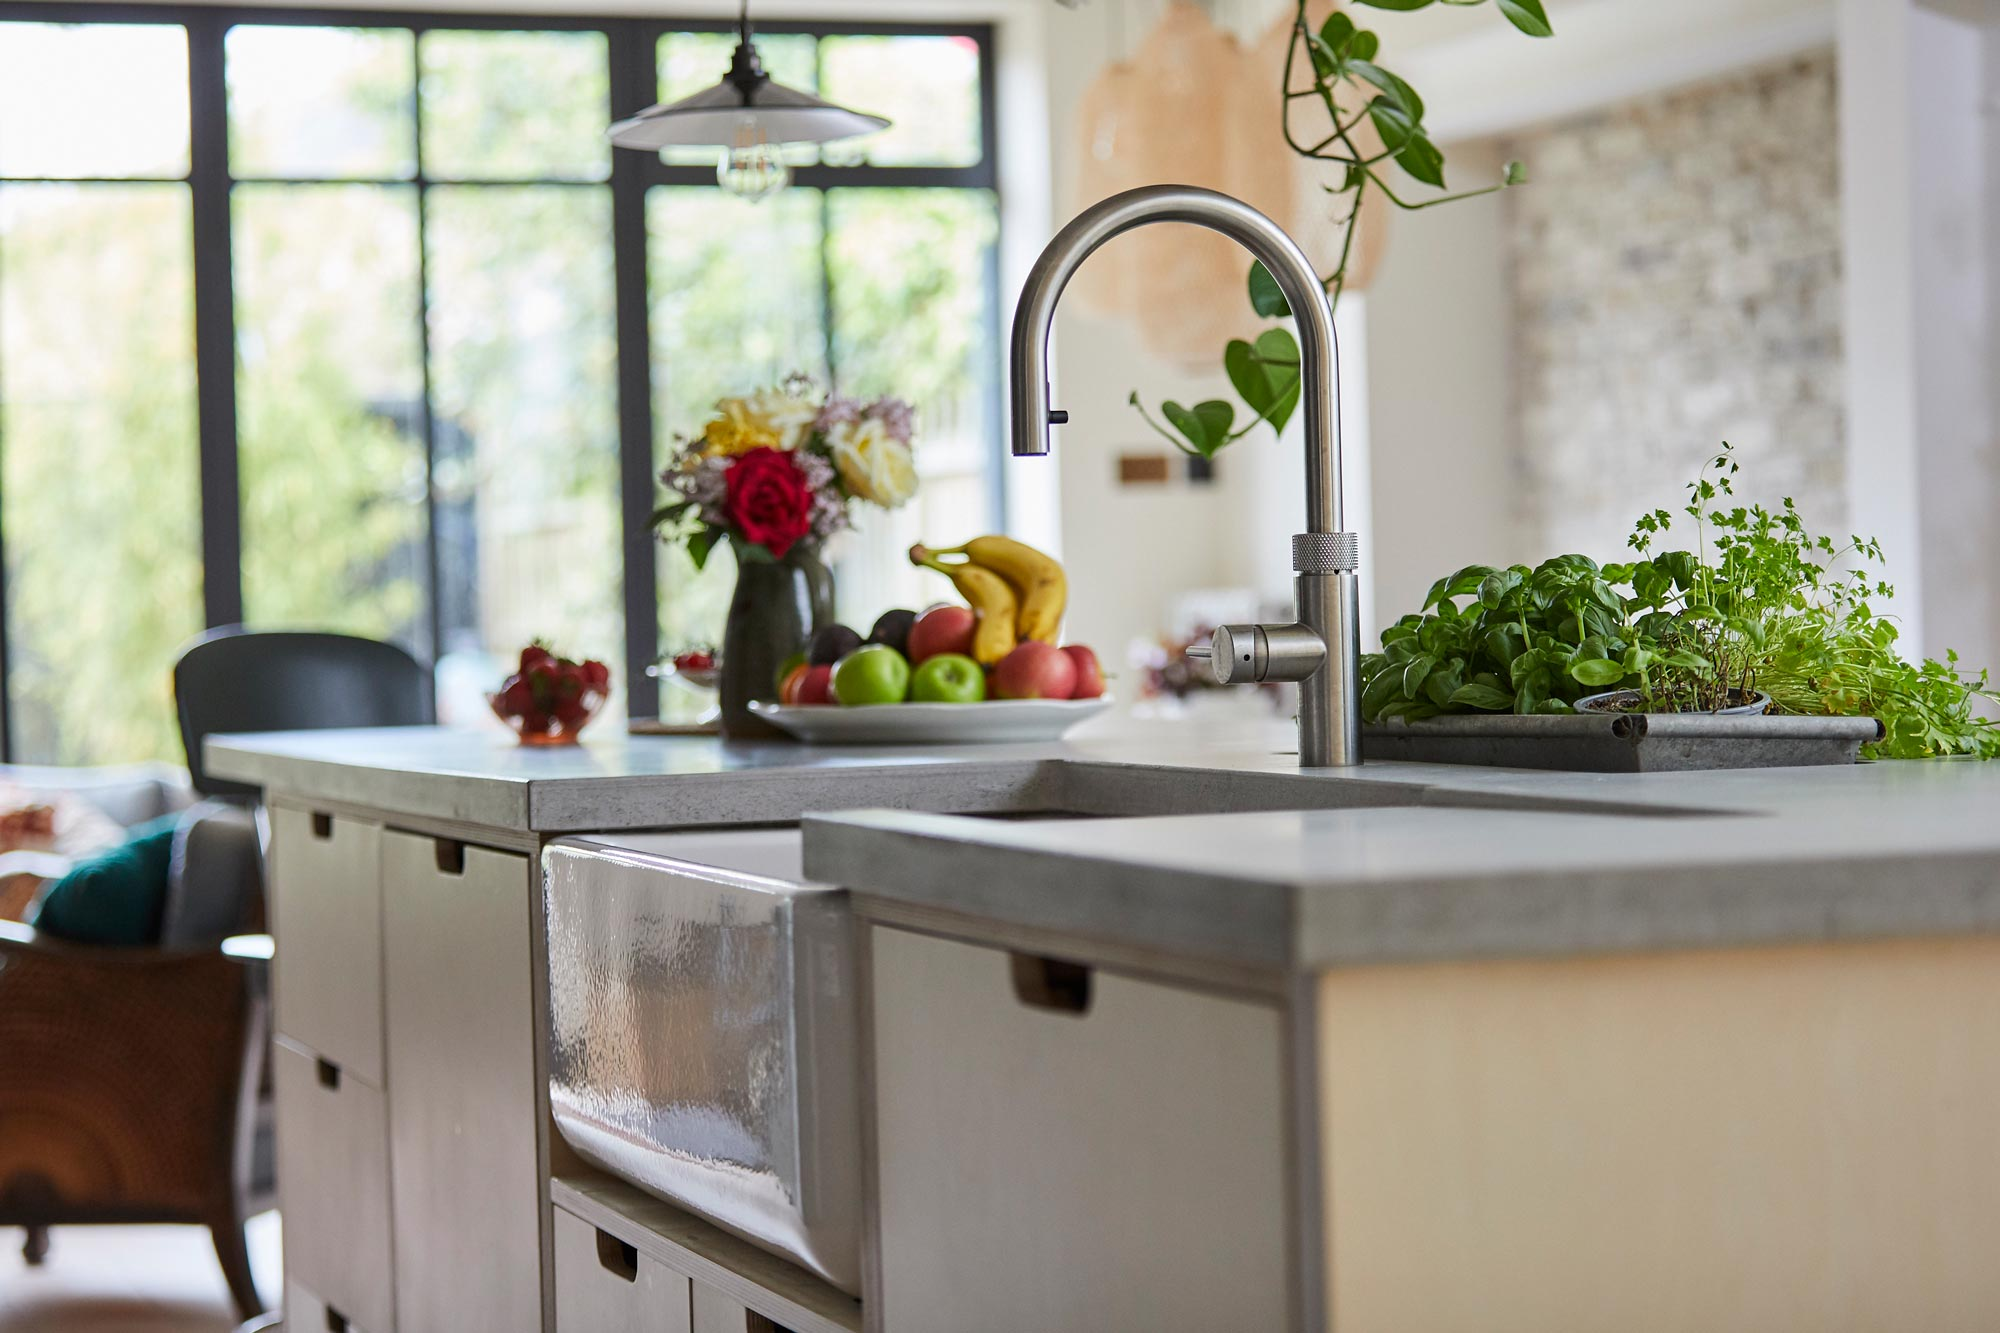 Ceramic Belfast double sink in bespoke plywood kitchen island